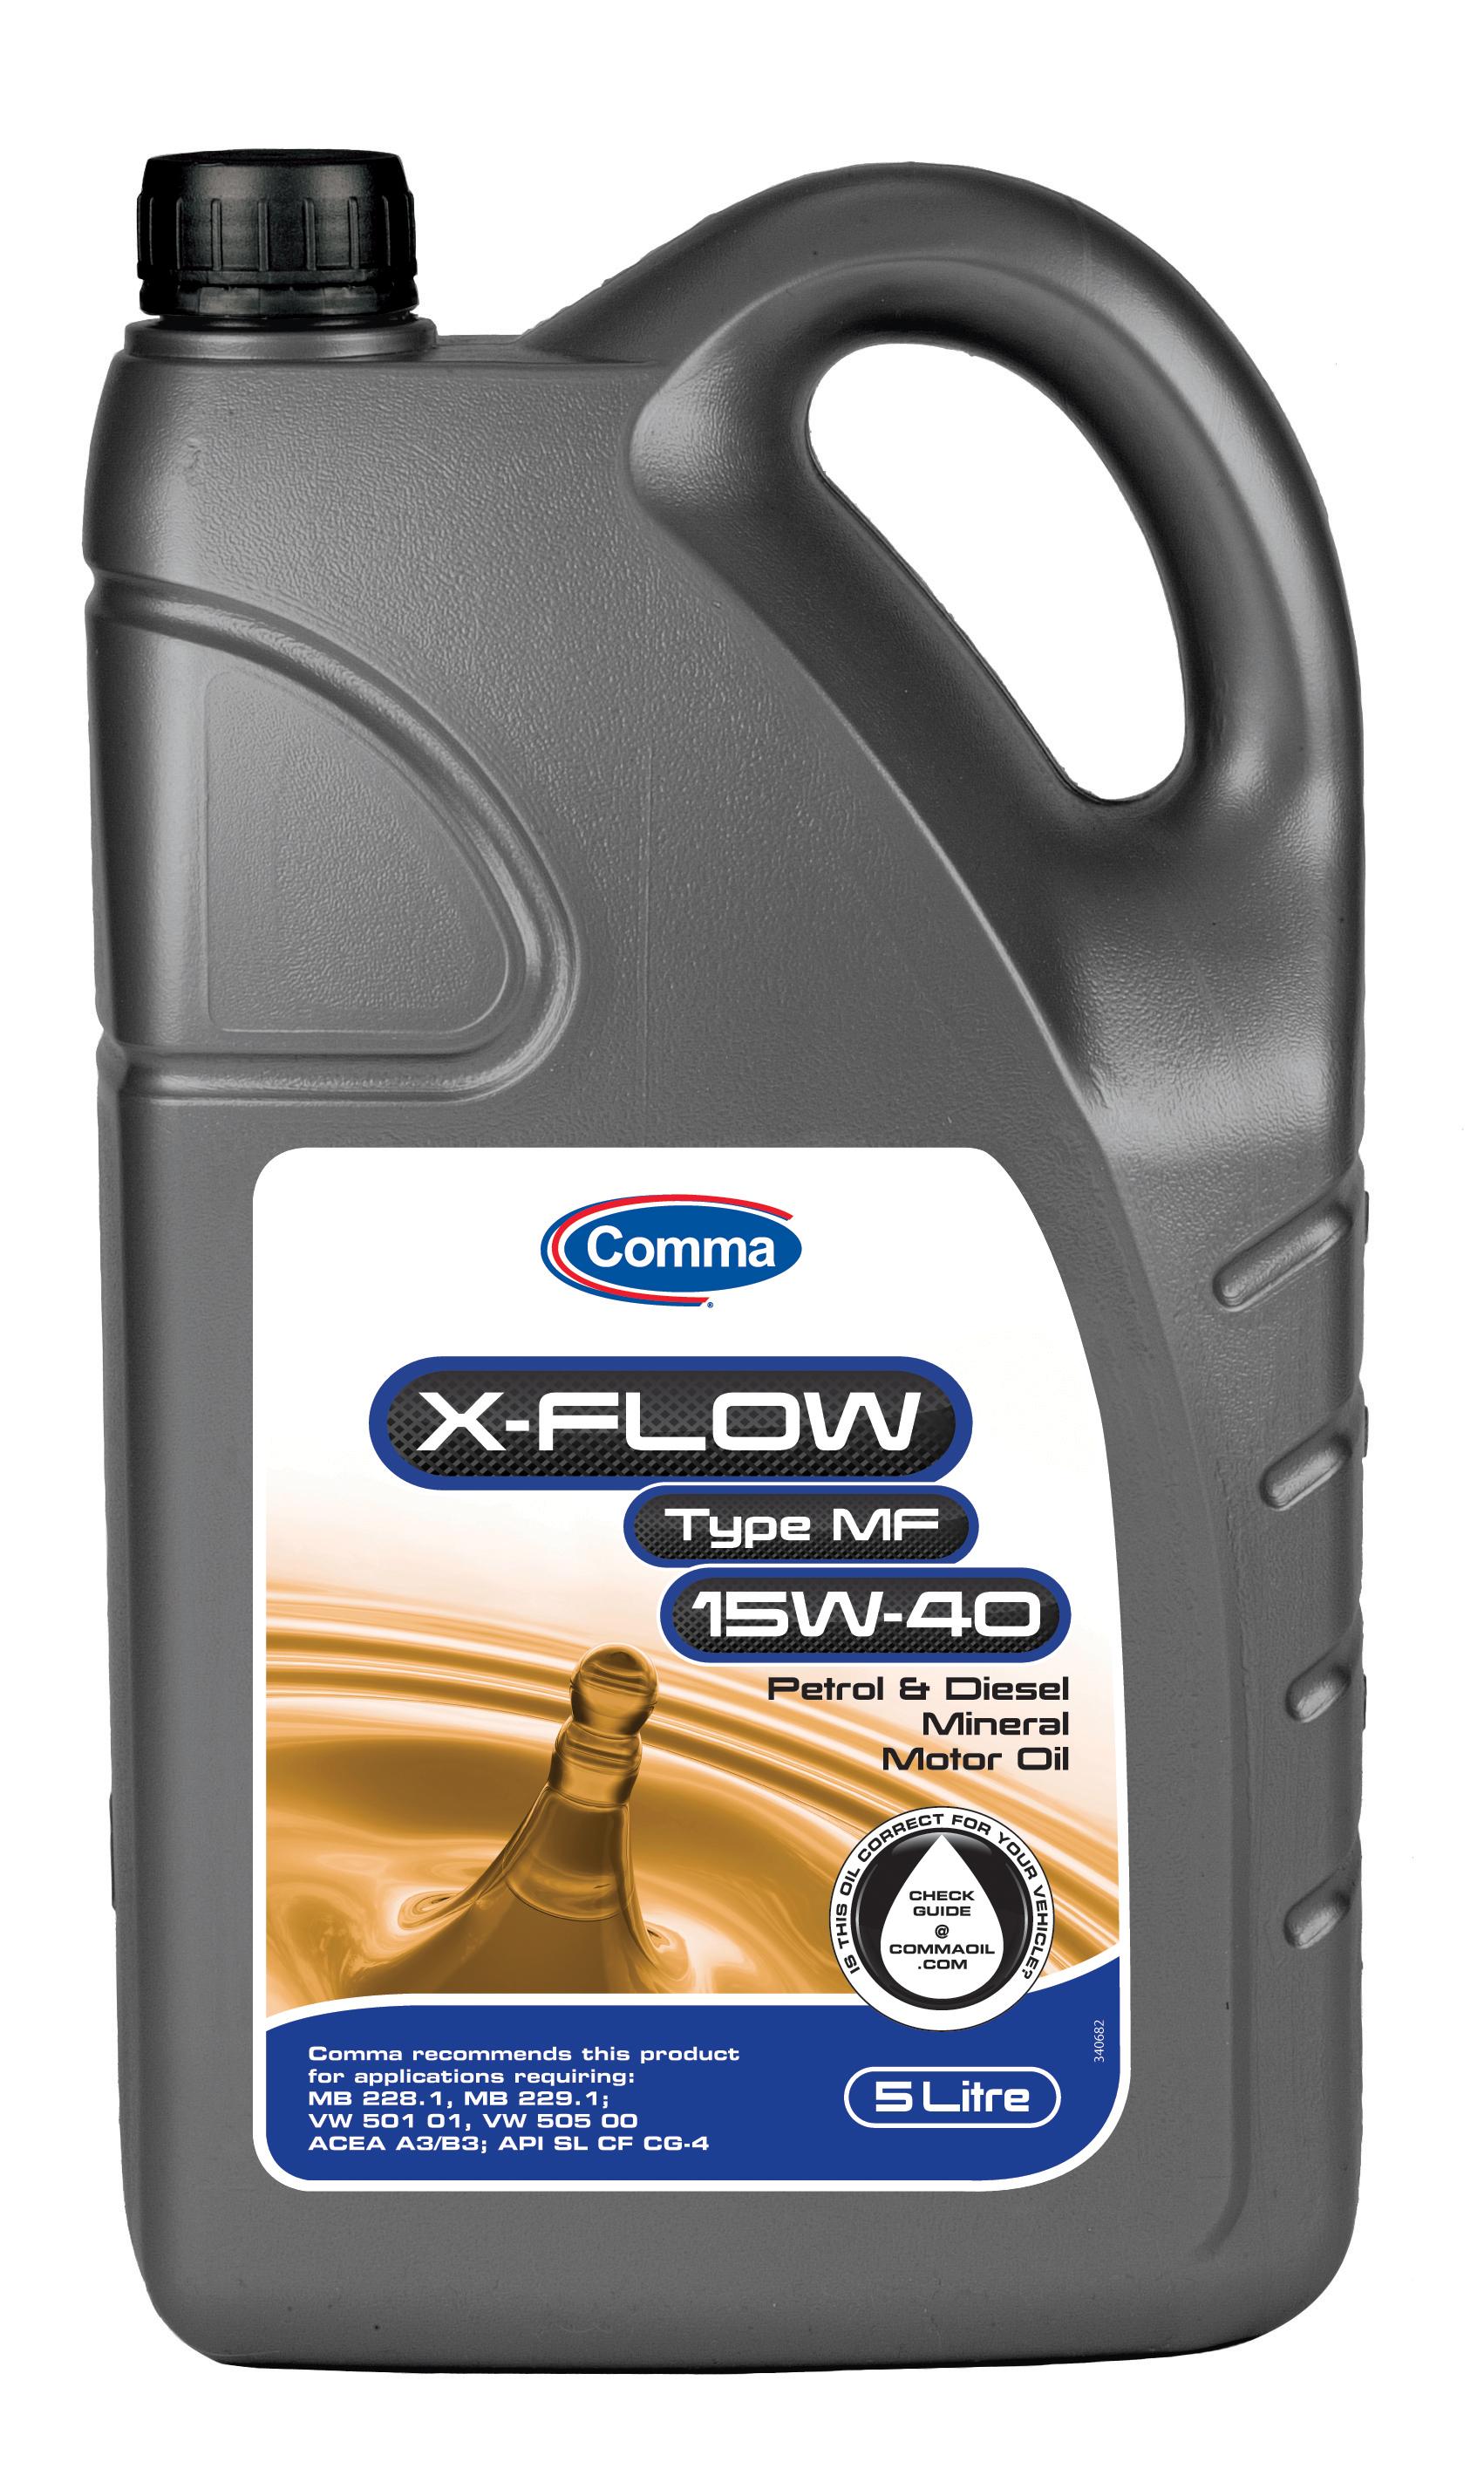 Comma X Flow Type Mf 15w 40 Mineral Motor Engine Oil 5